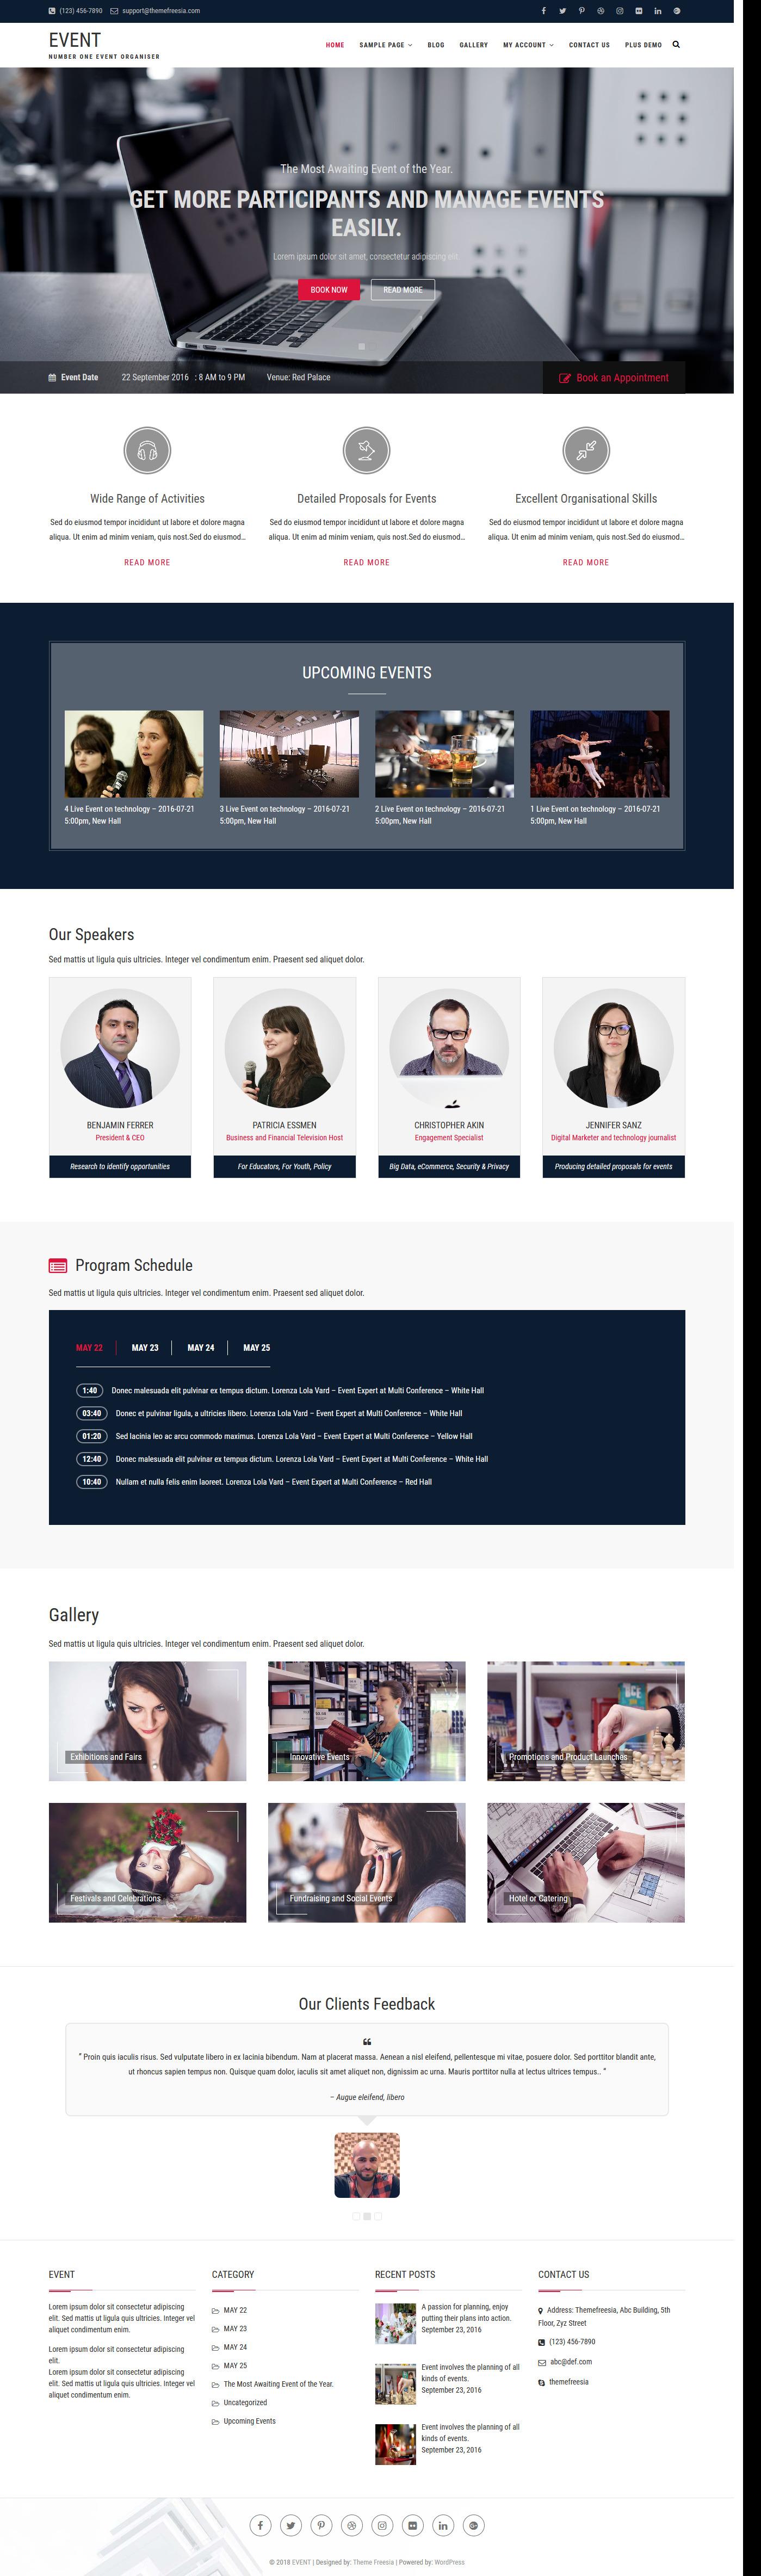 Event - Best Free Event WordPress Theme